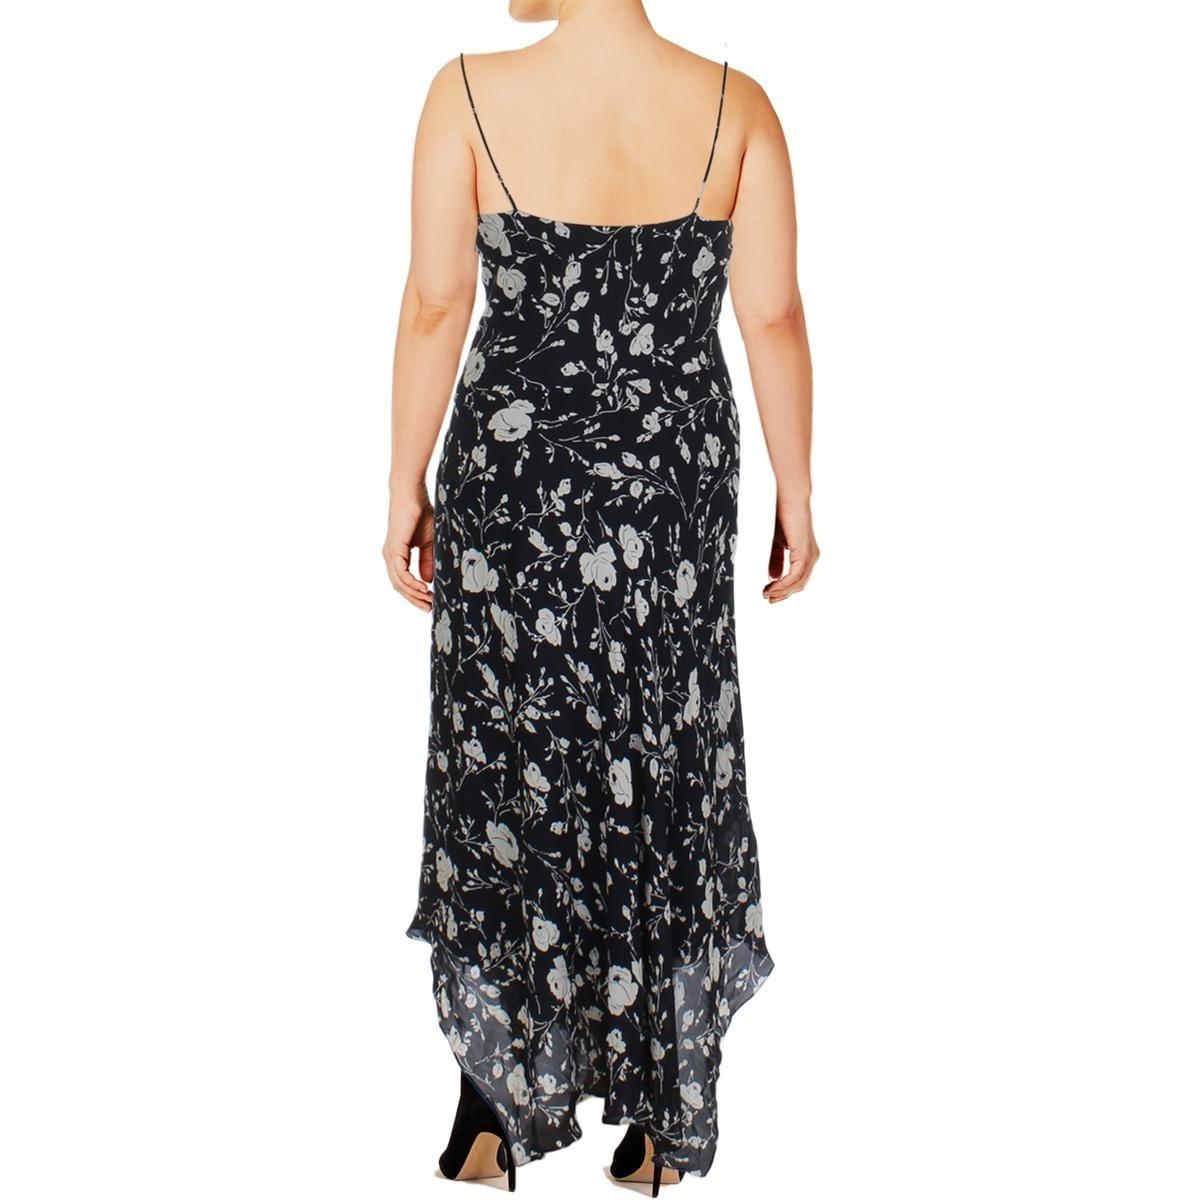 194c74e714 Shop Polo Ralph Lauren Womens Maxi Dress Silk Sleeveless - 14 - Free  Shipping Today - Overstock - 23051468